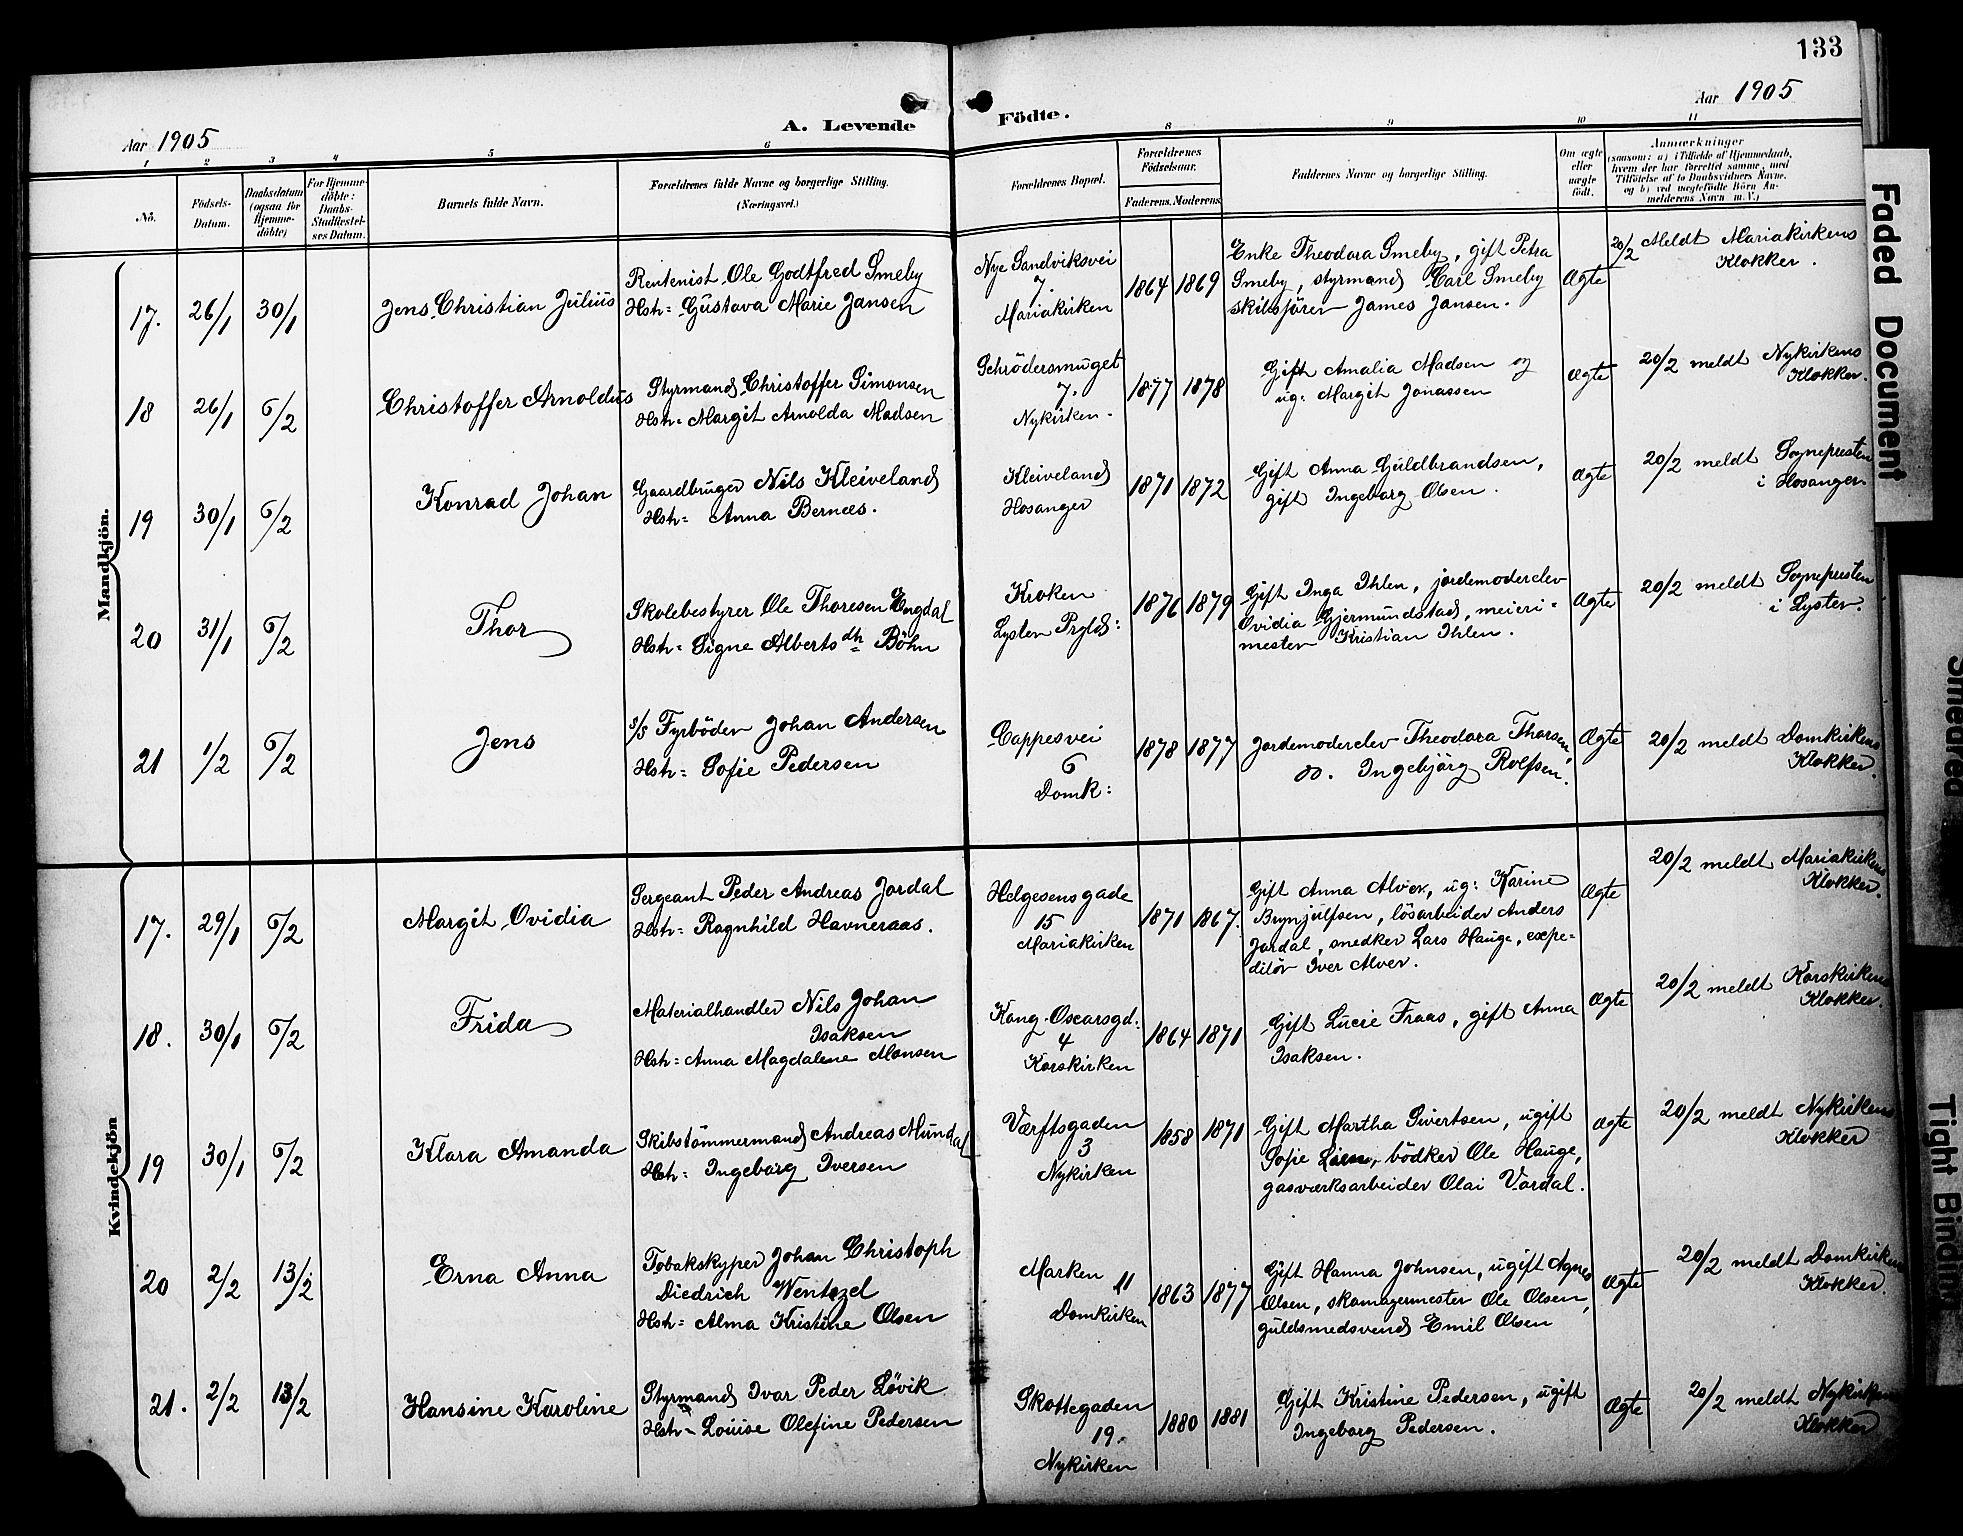 SAB, Fødselsstiftelsens sokneprestembete*, Ministerialbok nr. A 3, 1901-1910, s. 133